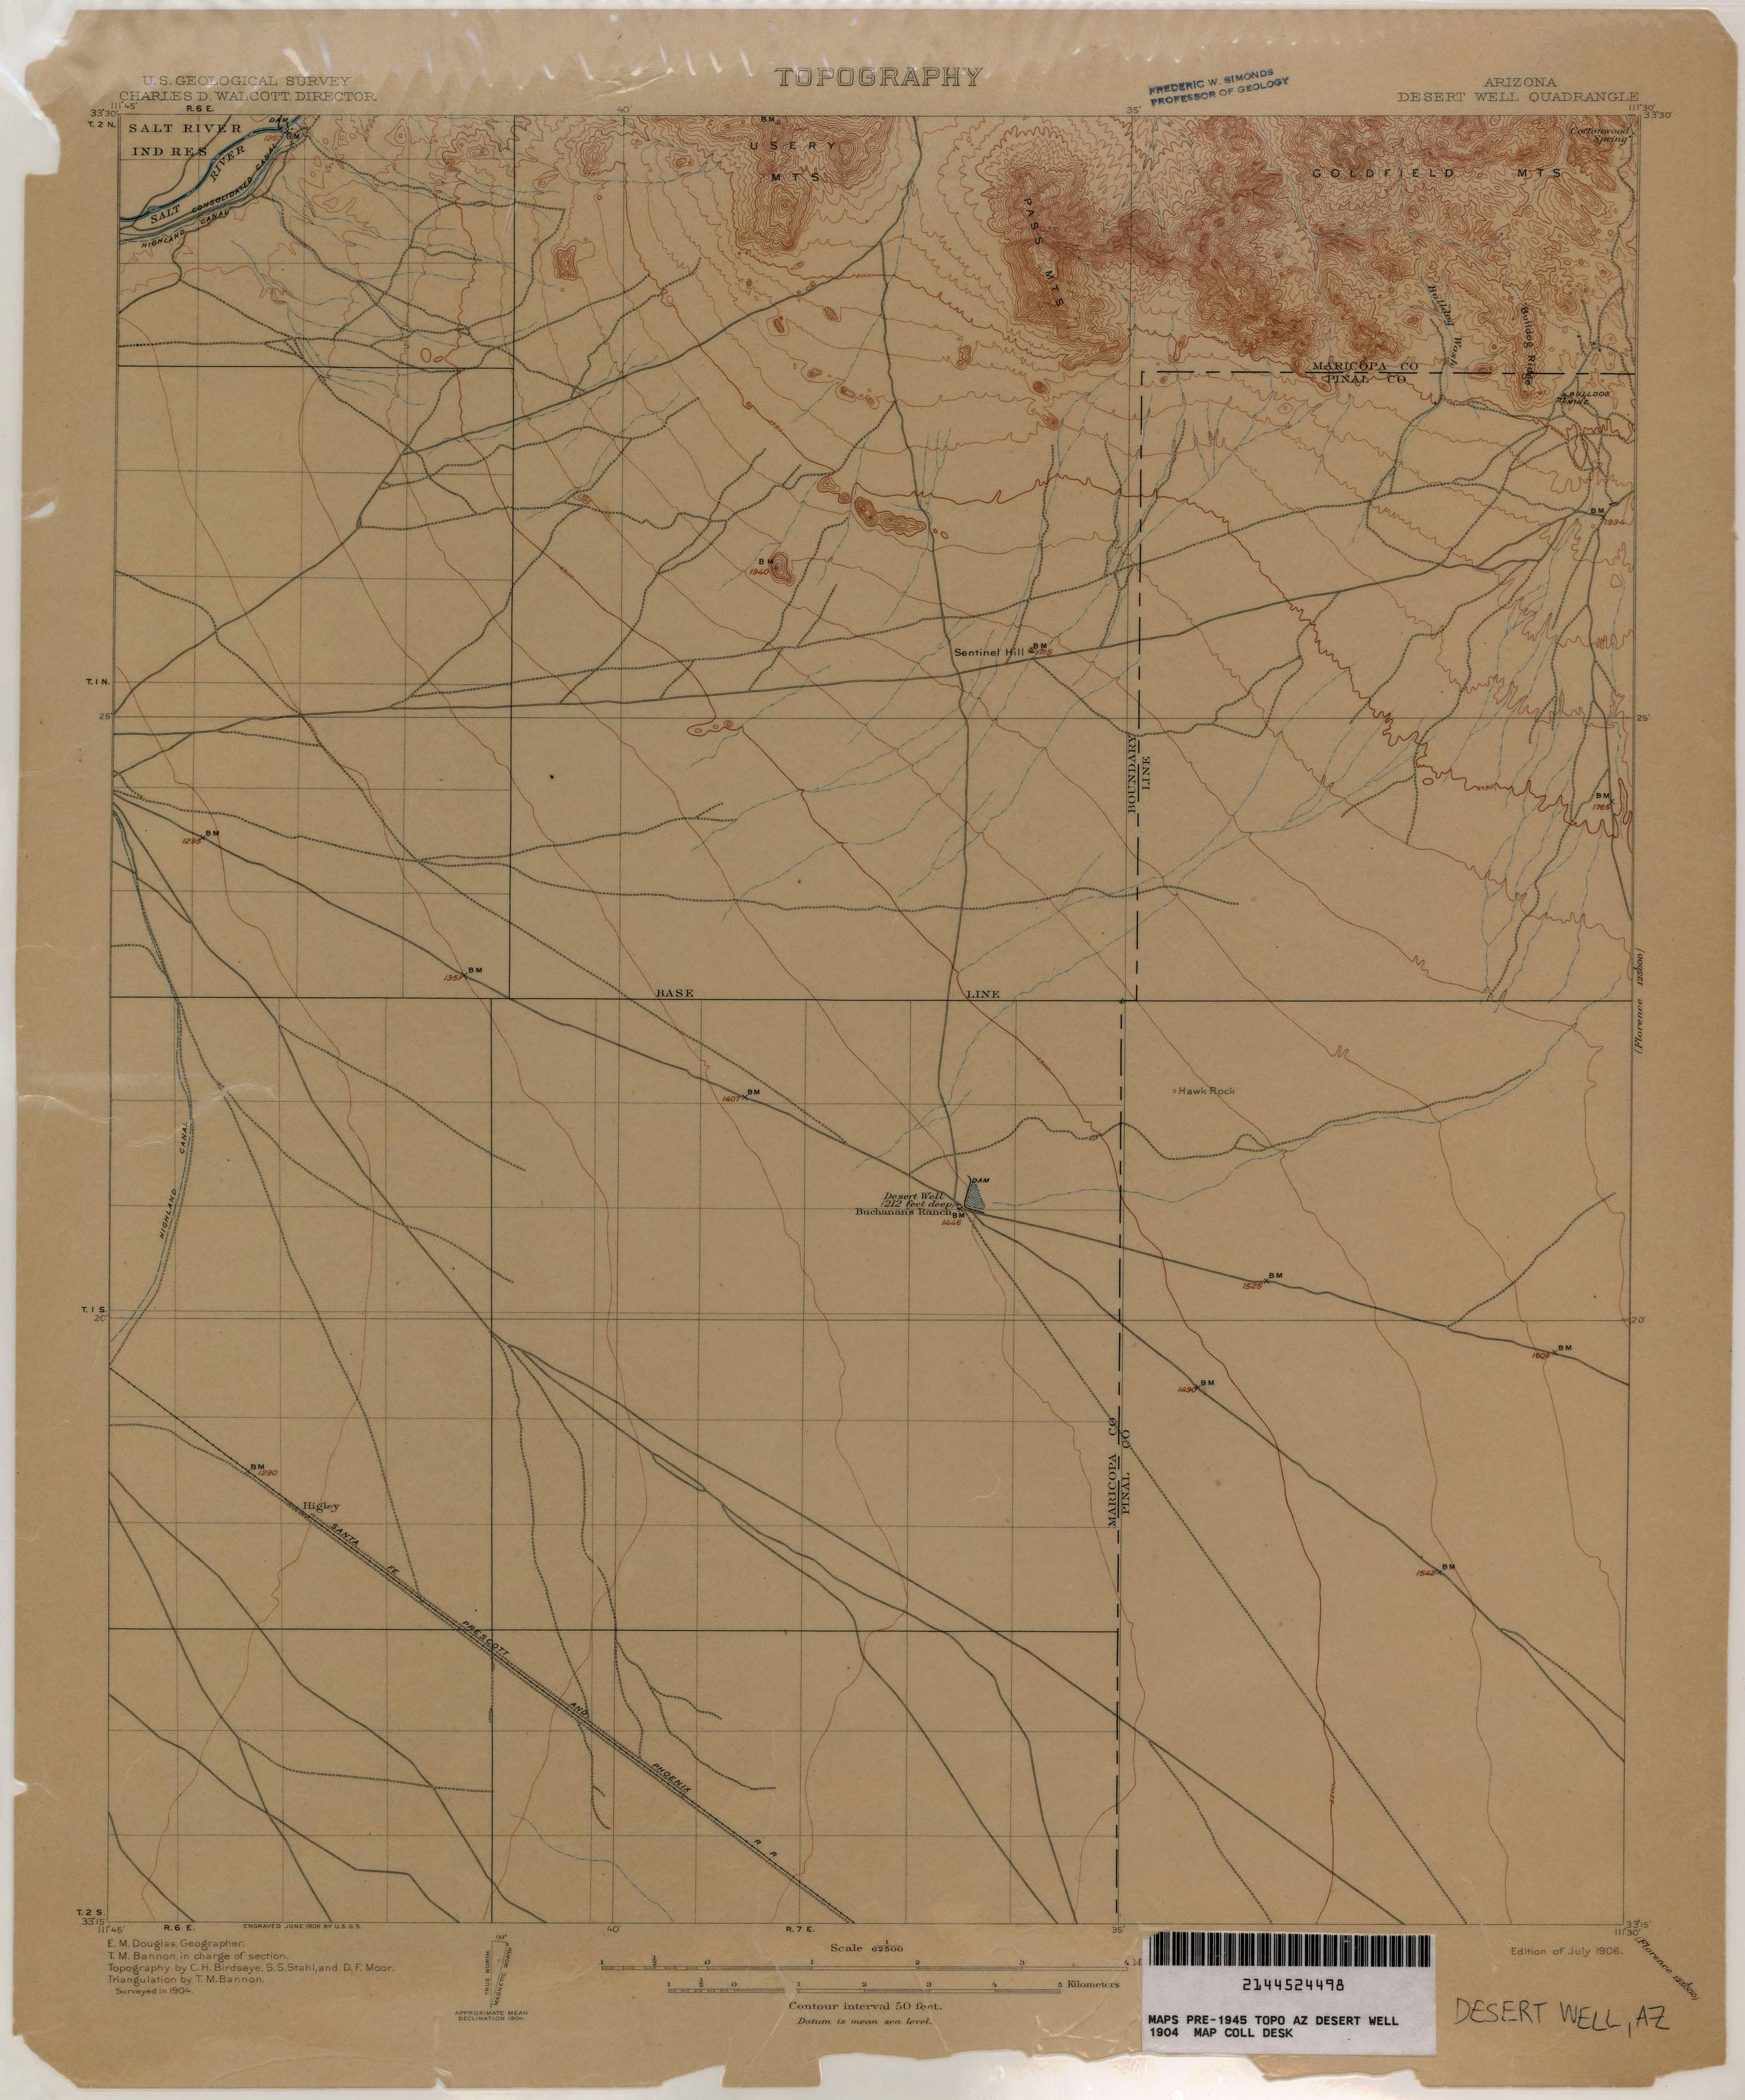 Topo Map Of Arizona.Arizona Historical Topographic Maps Perry Castaneda Map Collection